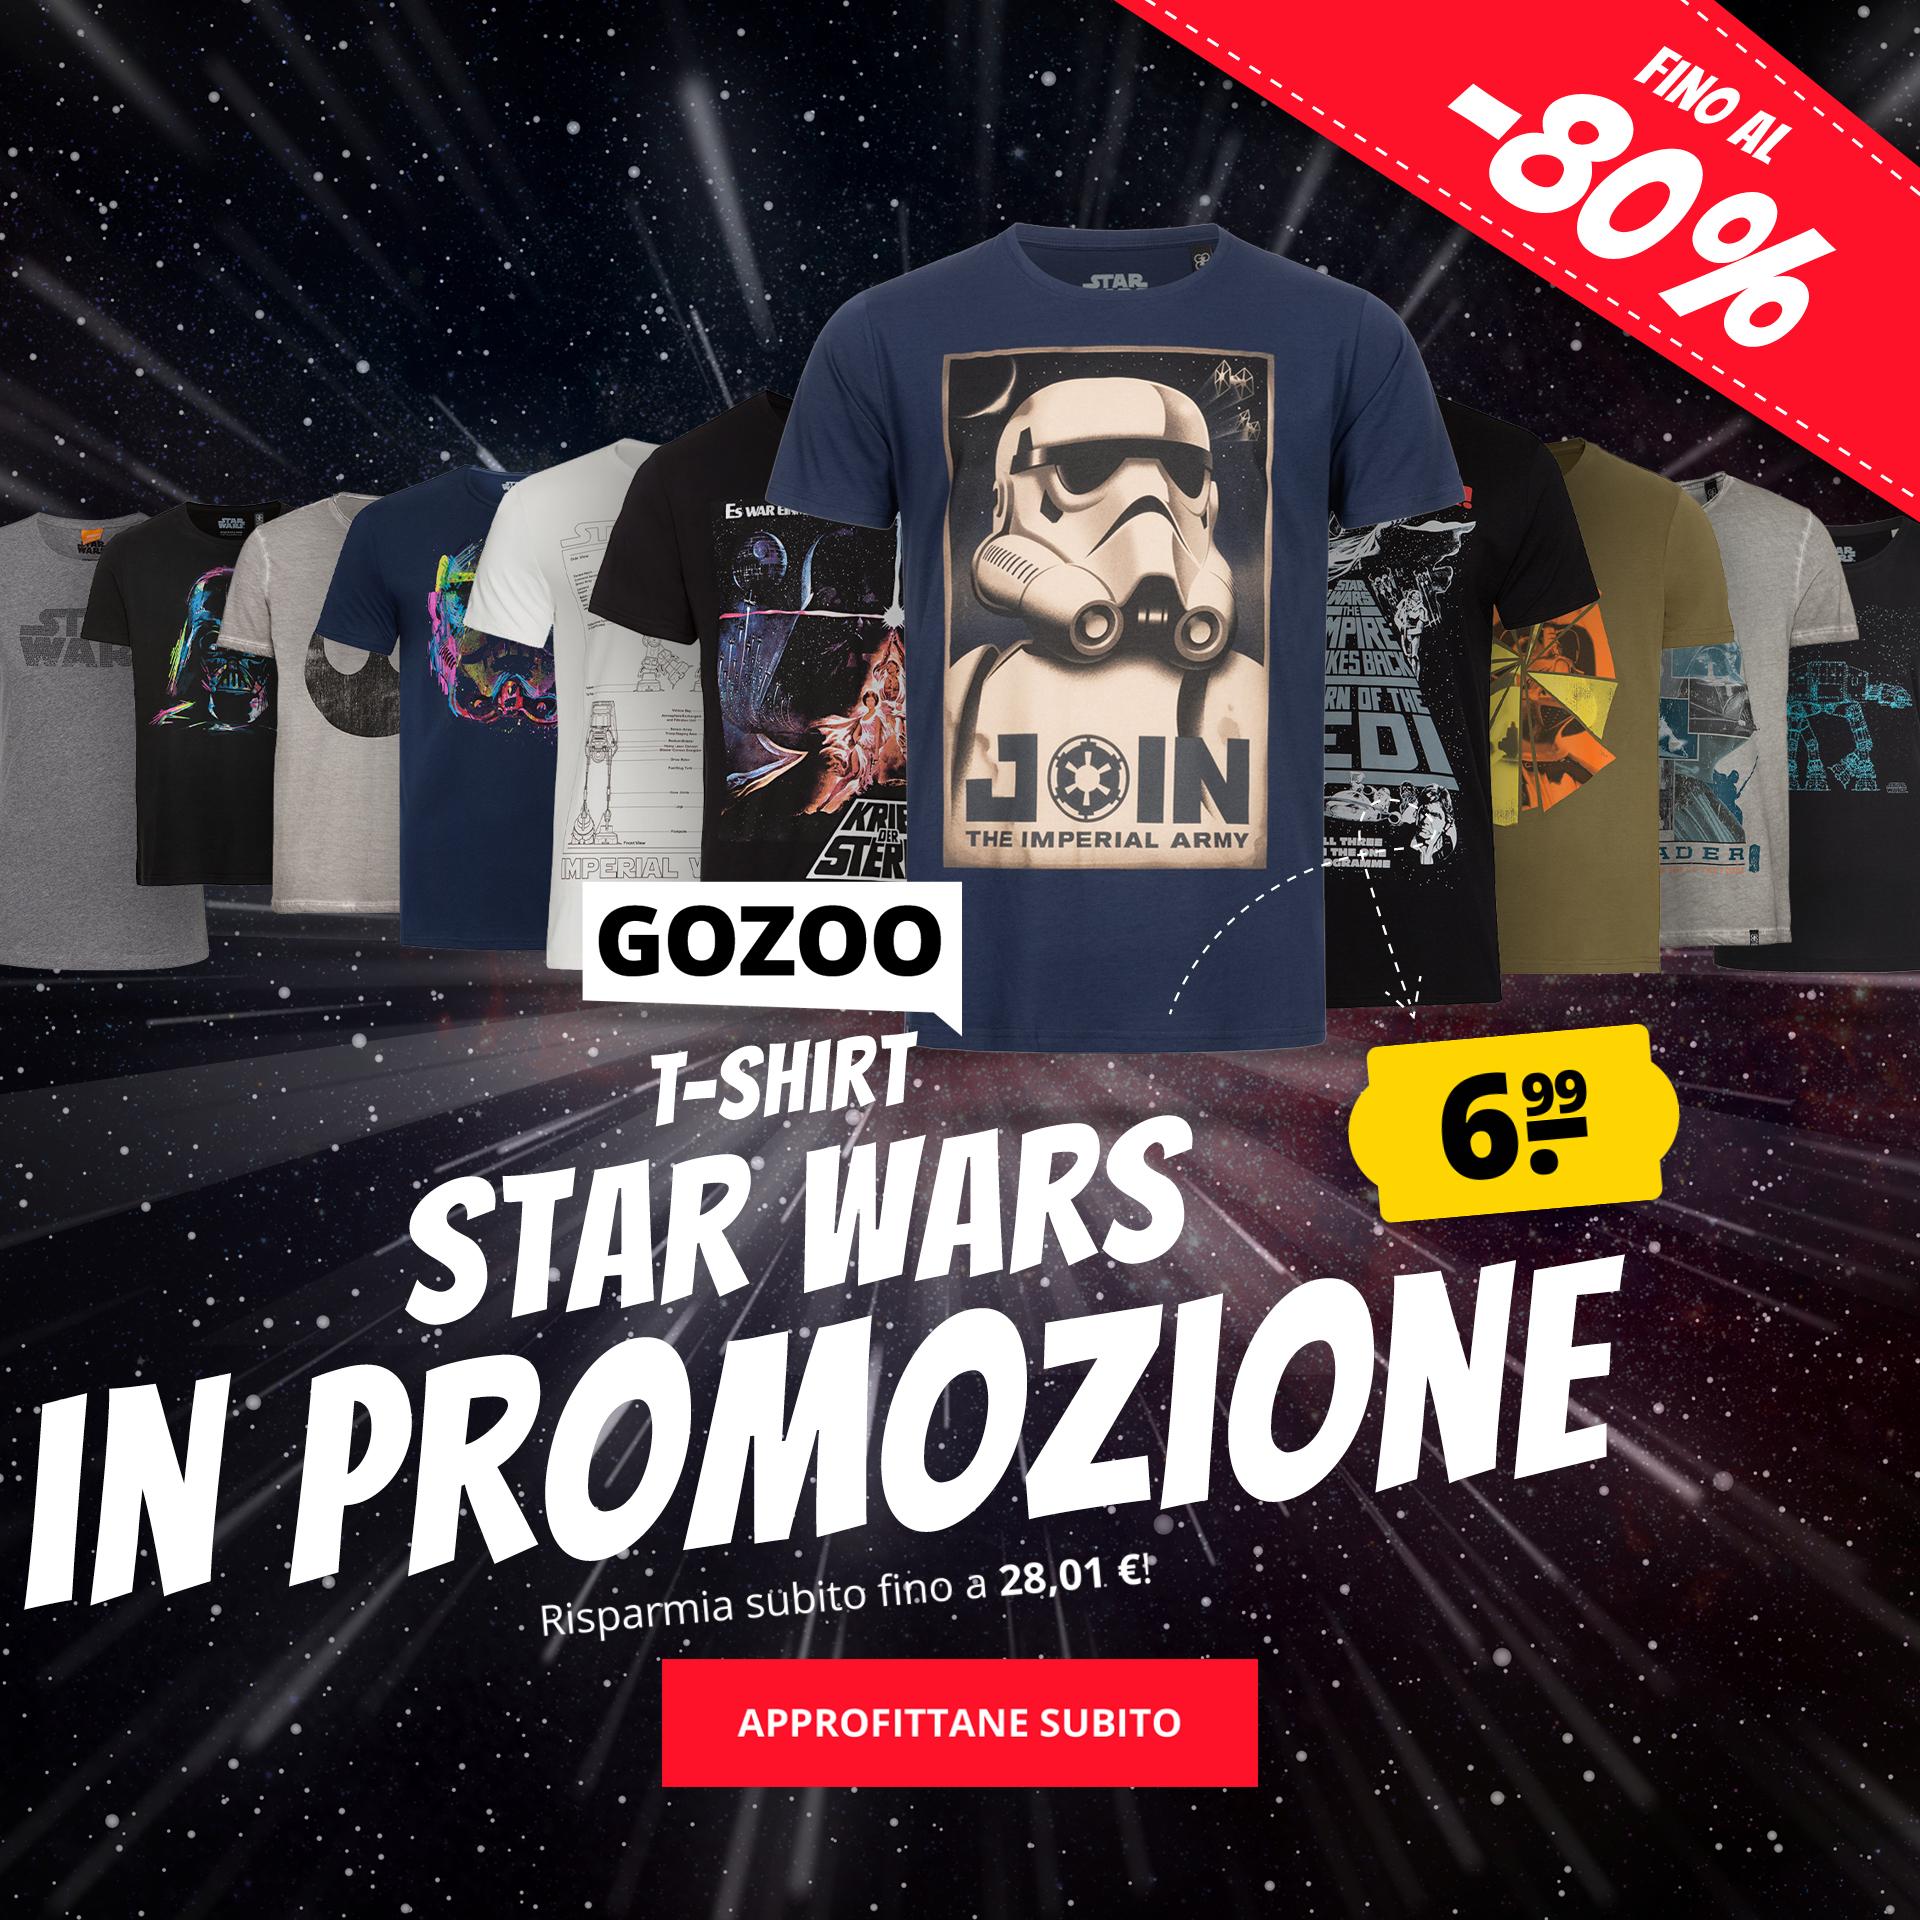 GOZOO T-shirt Star Wars in promozione solo 6,99 €